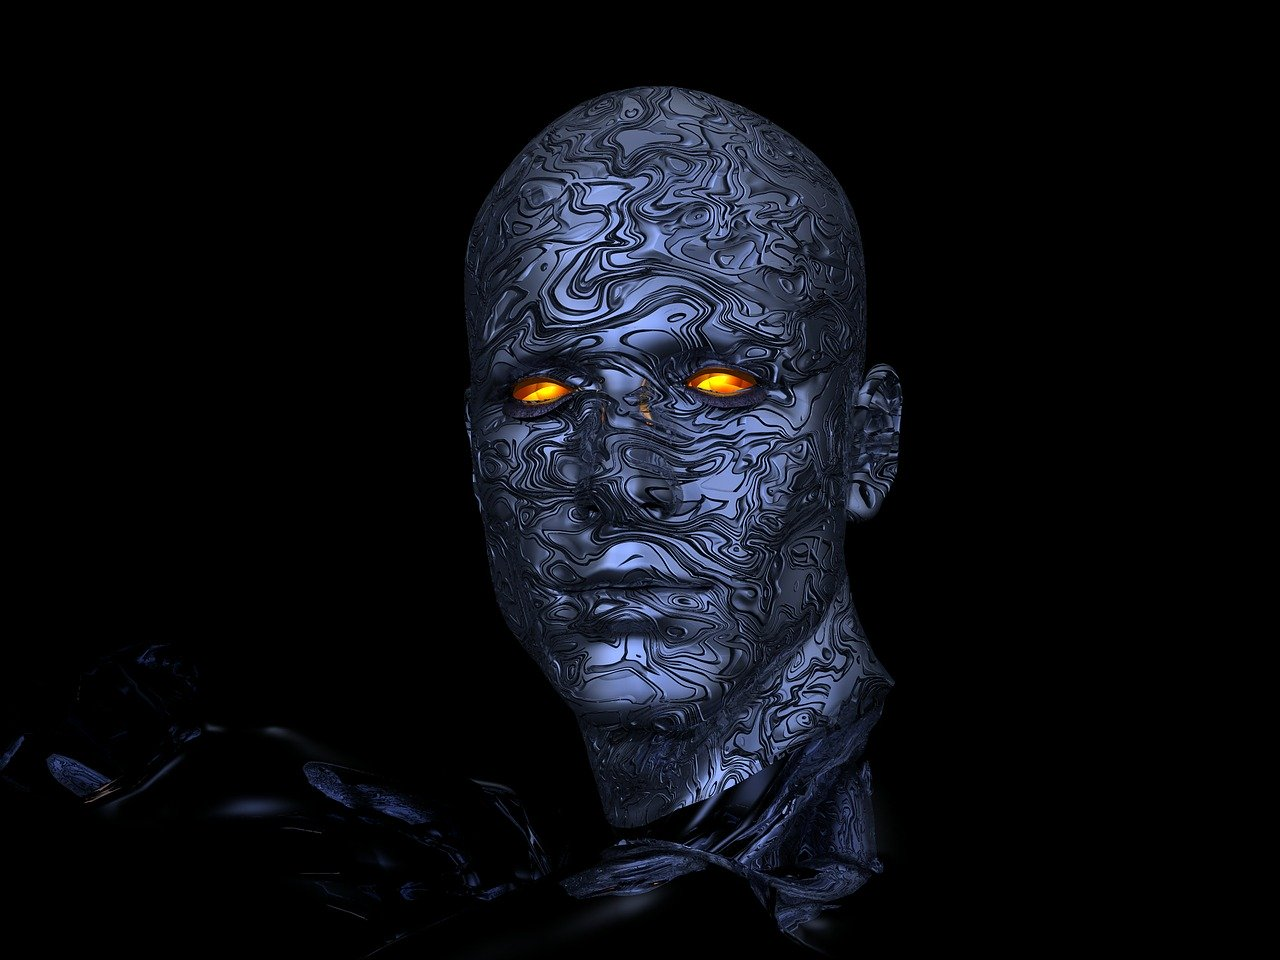 Cyborg Robot Head Futuristic  - Stevebidmead / Pixabay